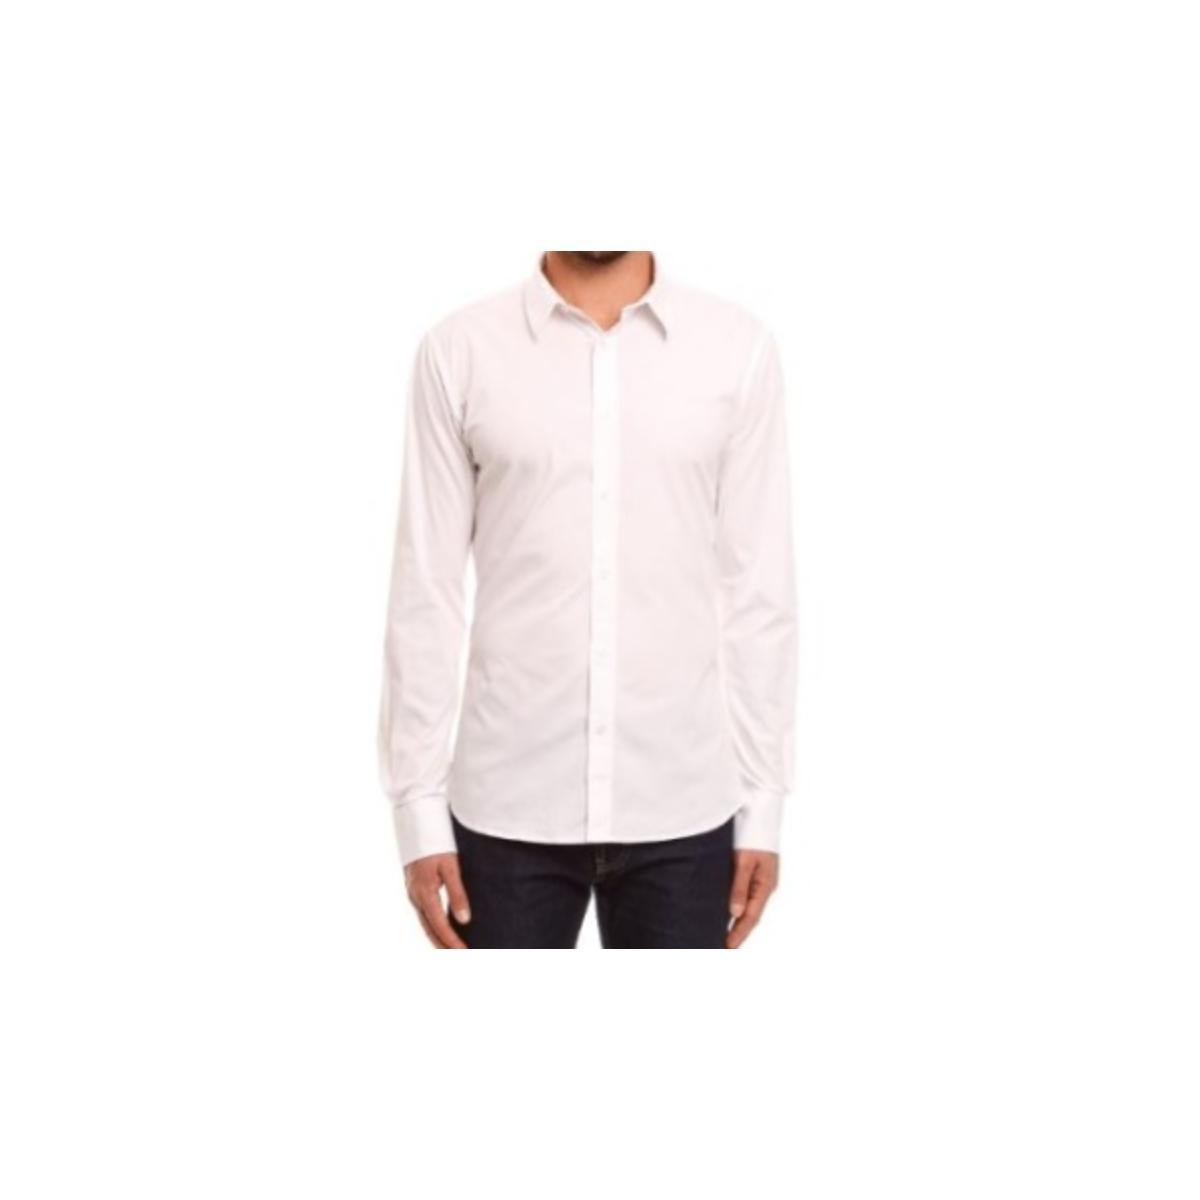 Camisa Masculina Colcci 310103397 001 Branco